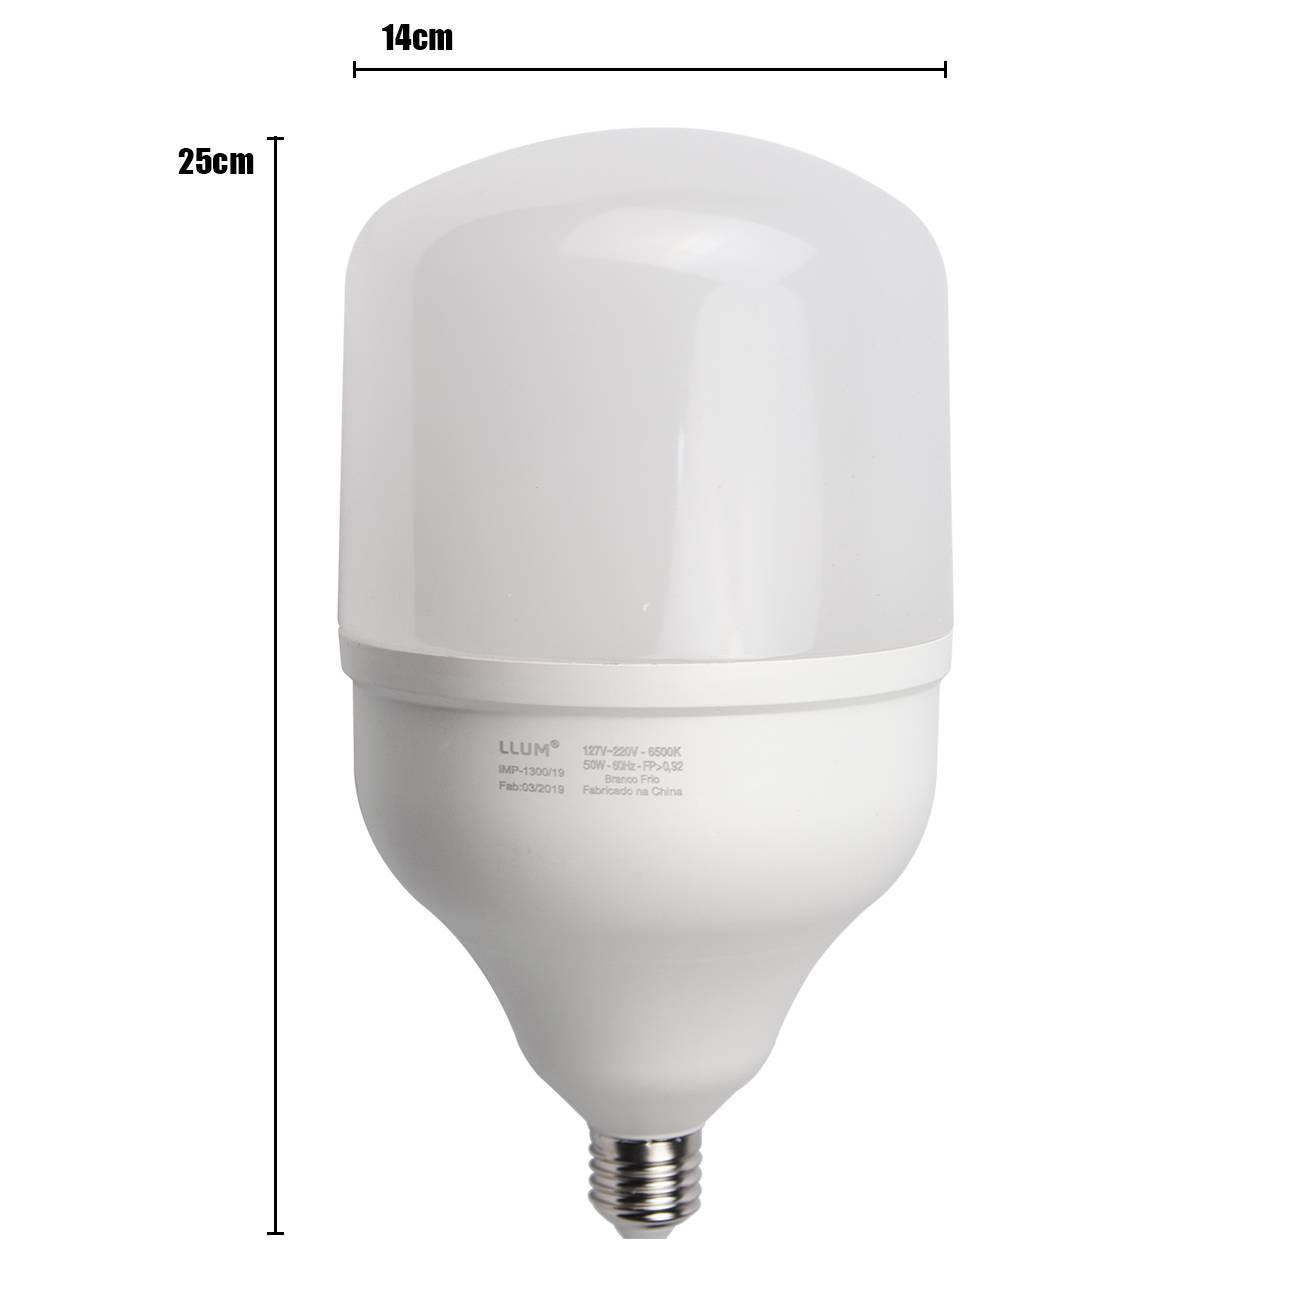 Lâmpada Led Bulbo High Llum 50w Luz Branca 6500k Bivolt - LCGELETRO